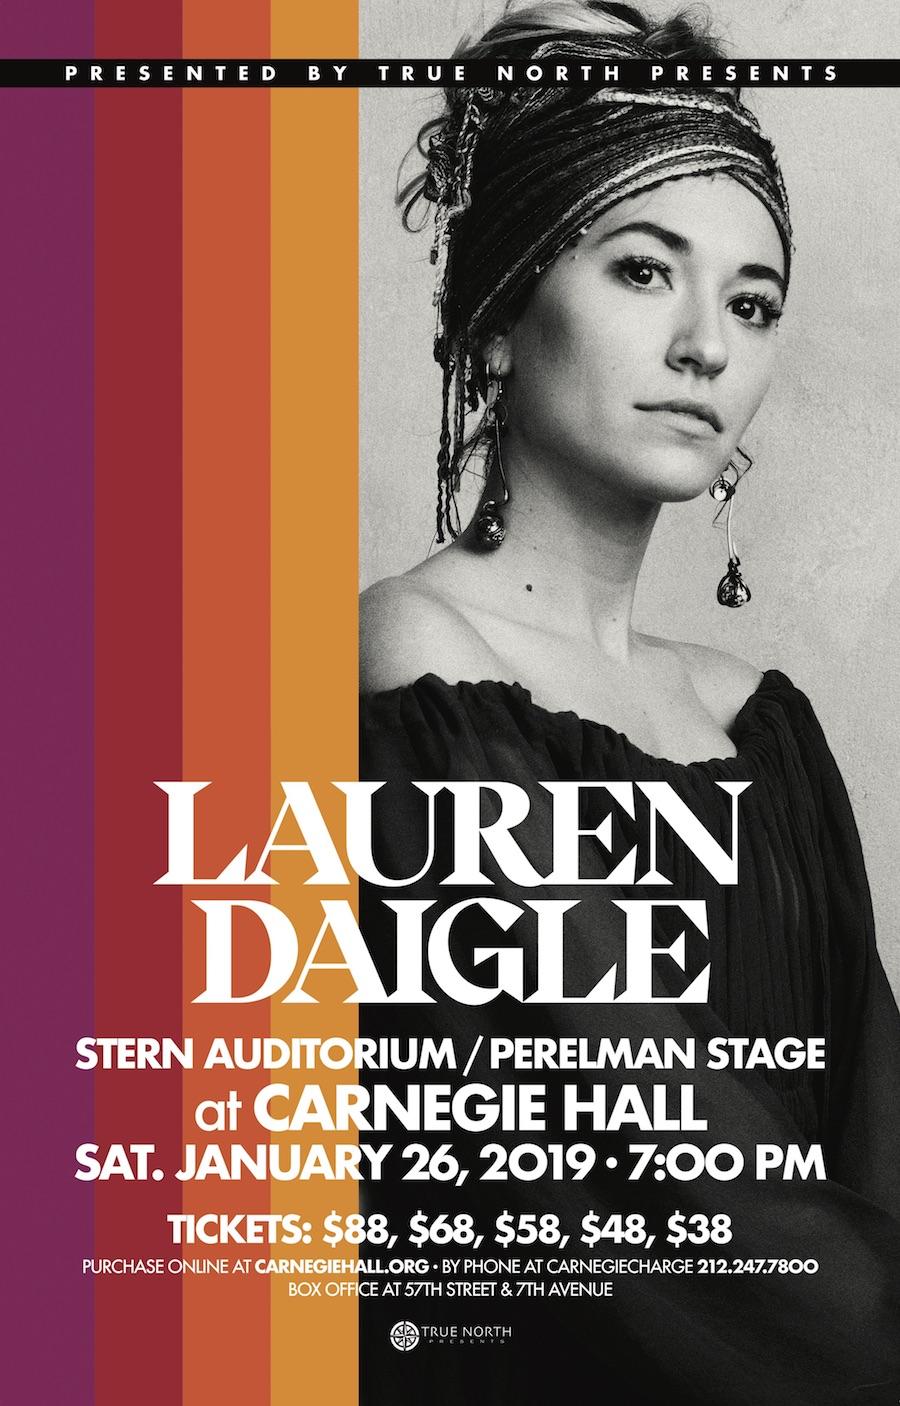 Lauren Daigle Carnegie Hall Lobby small.jpg